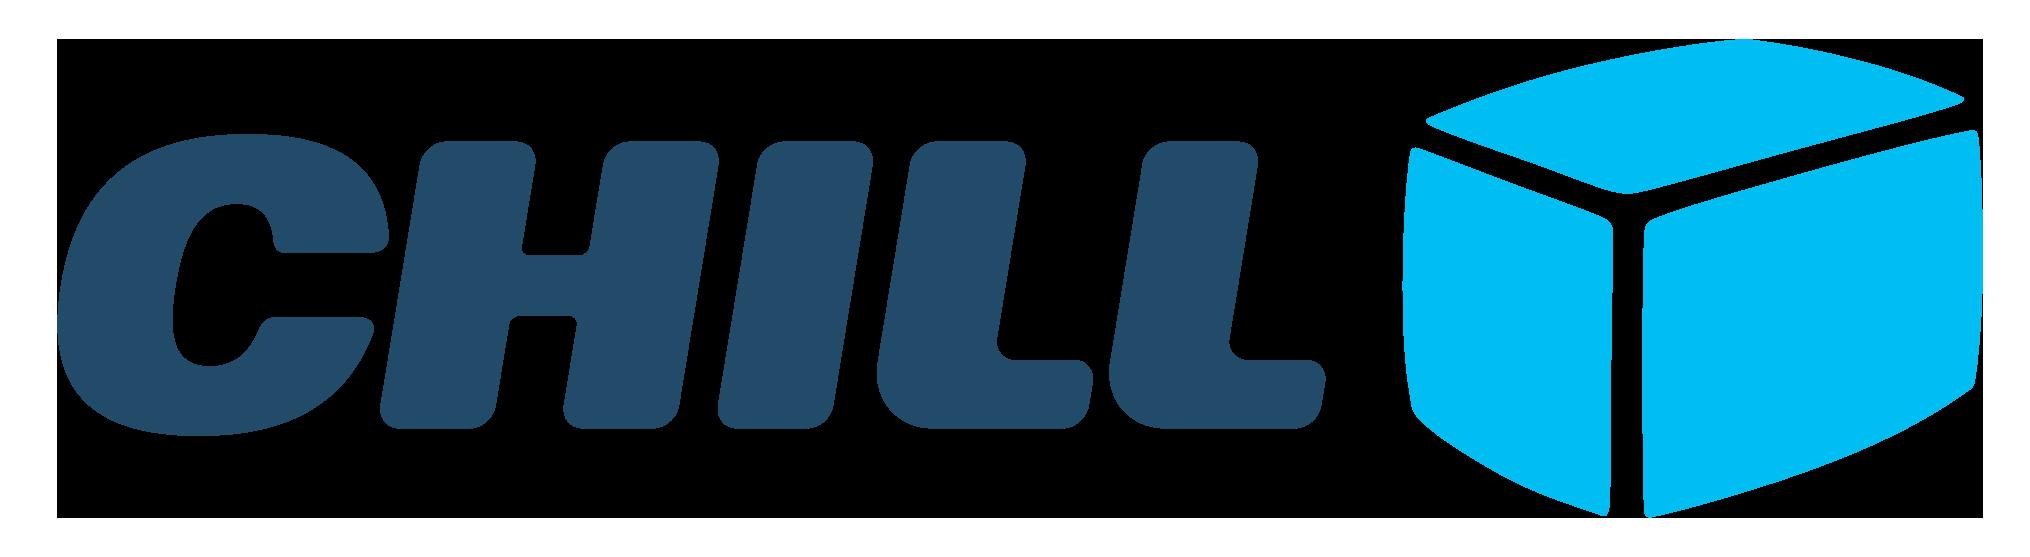 Chill logo rgb primary